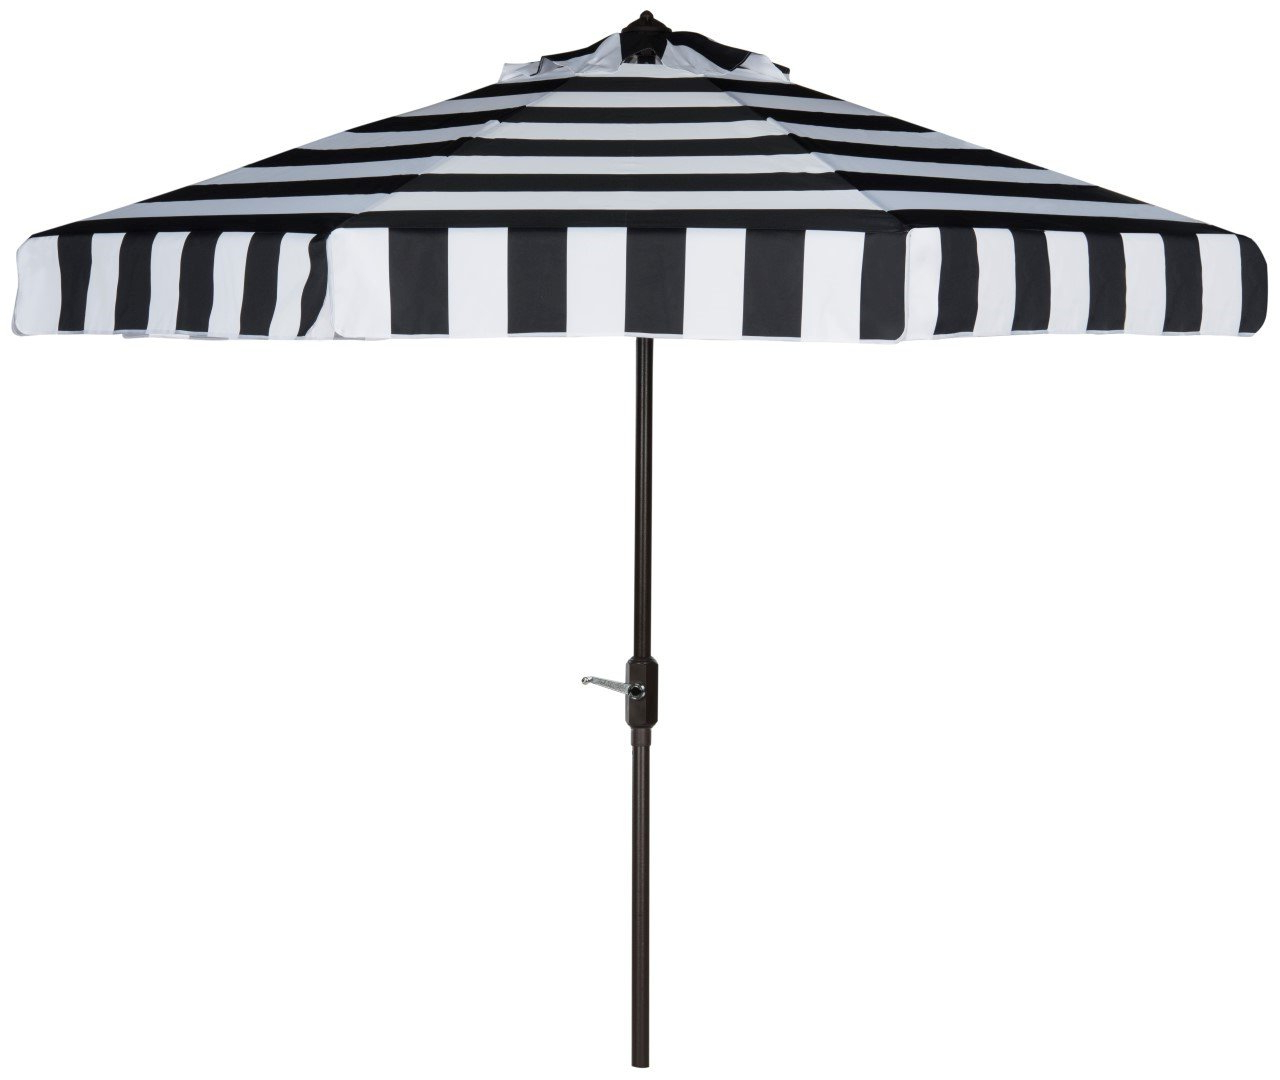 Favorite Annabelle Market Umbrellas With Regard To Seaport 9' Market Umbrella (View 11 of 20)